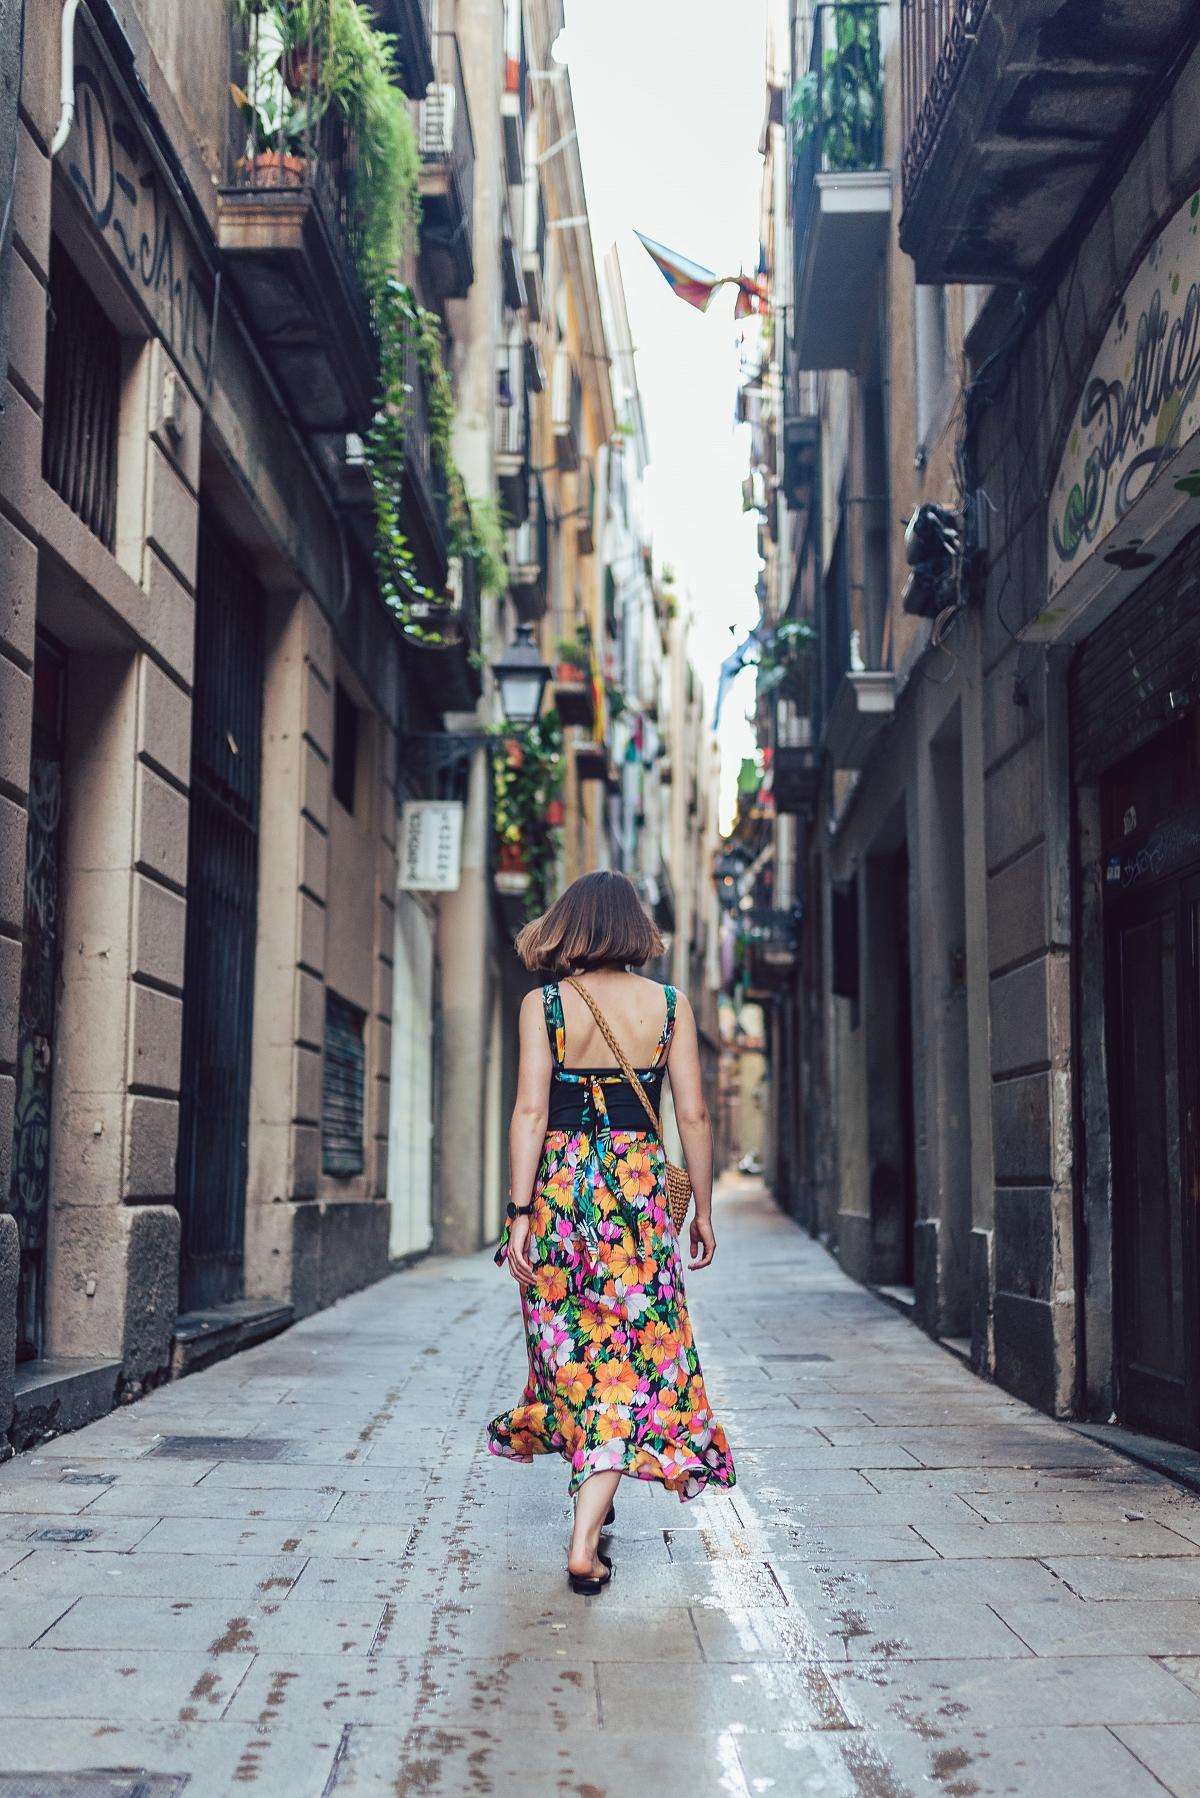 Barcelona sesja modowa spódnica 7/8 klapki mules pleciona torebka